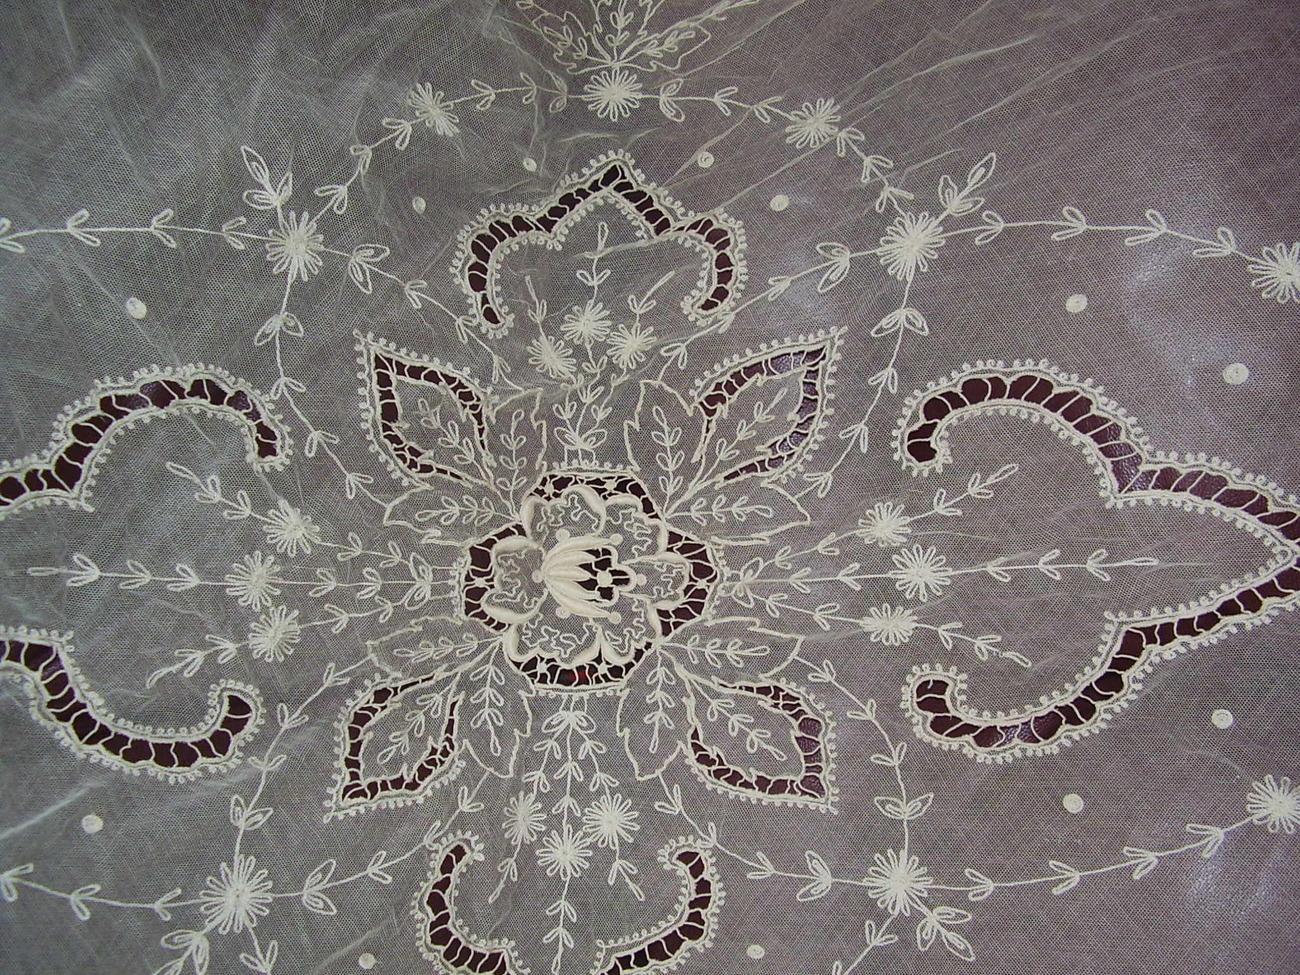 Vintage - Sheer Bed Cover image 3